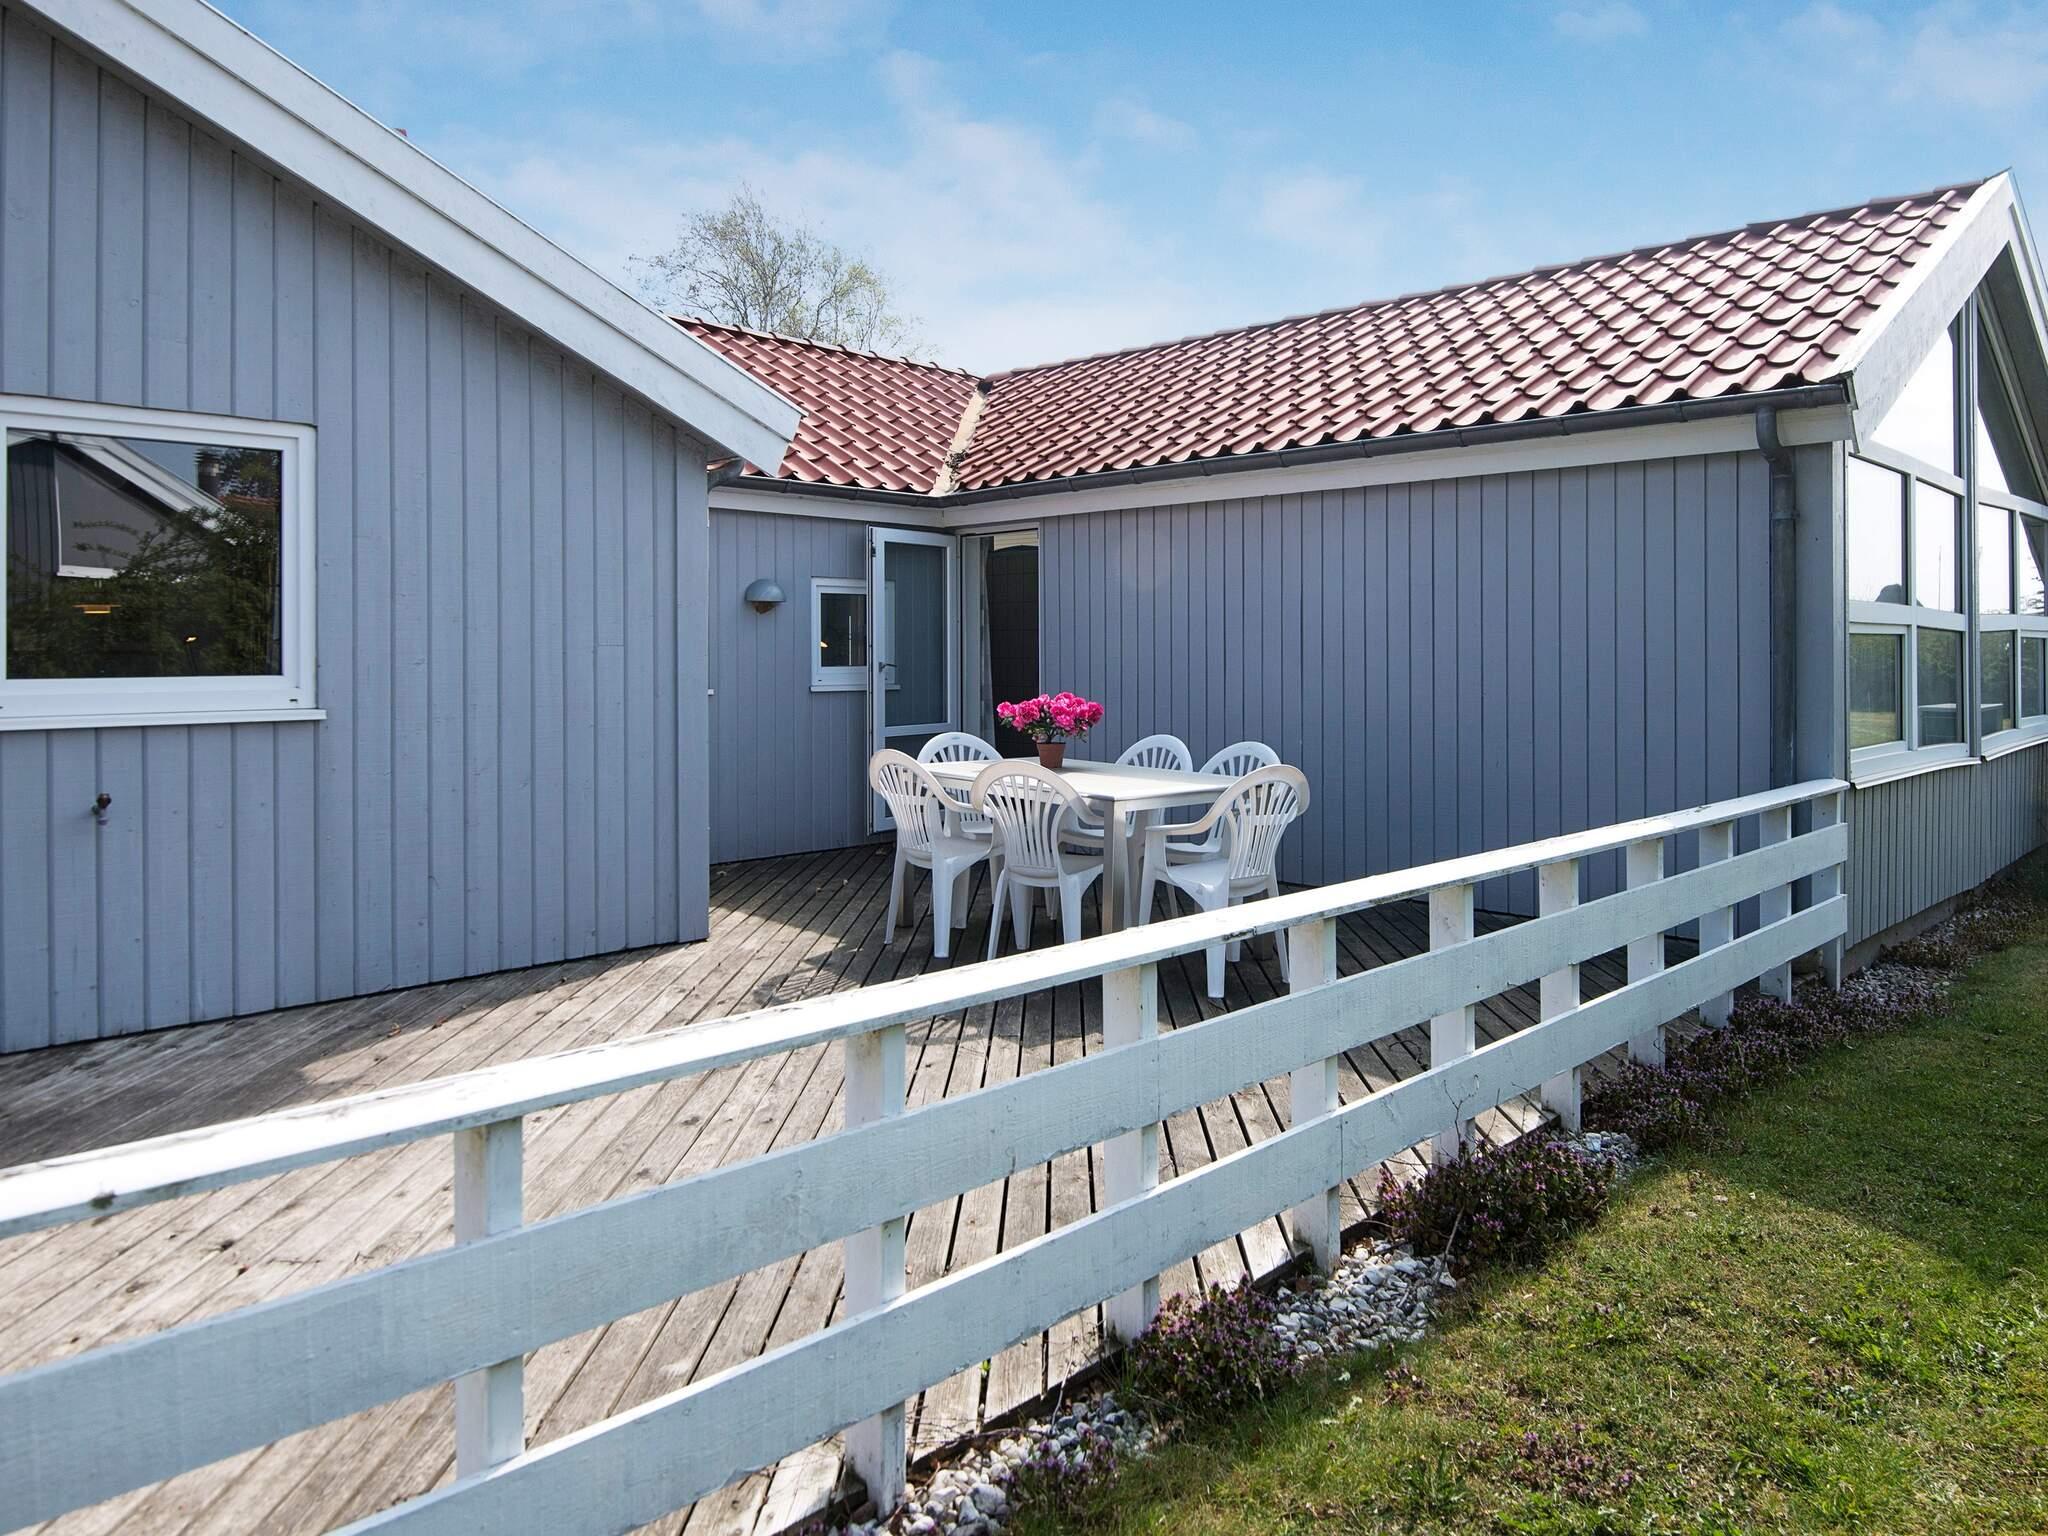 Ferienhaus Lyngsbæk Strand (493391), Ebeltoft, , Ostjütland, Dänemark, Bild 25